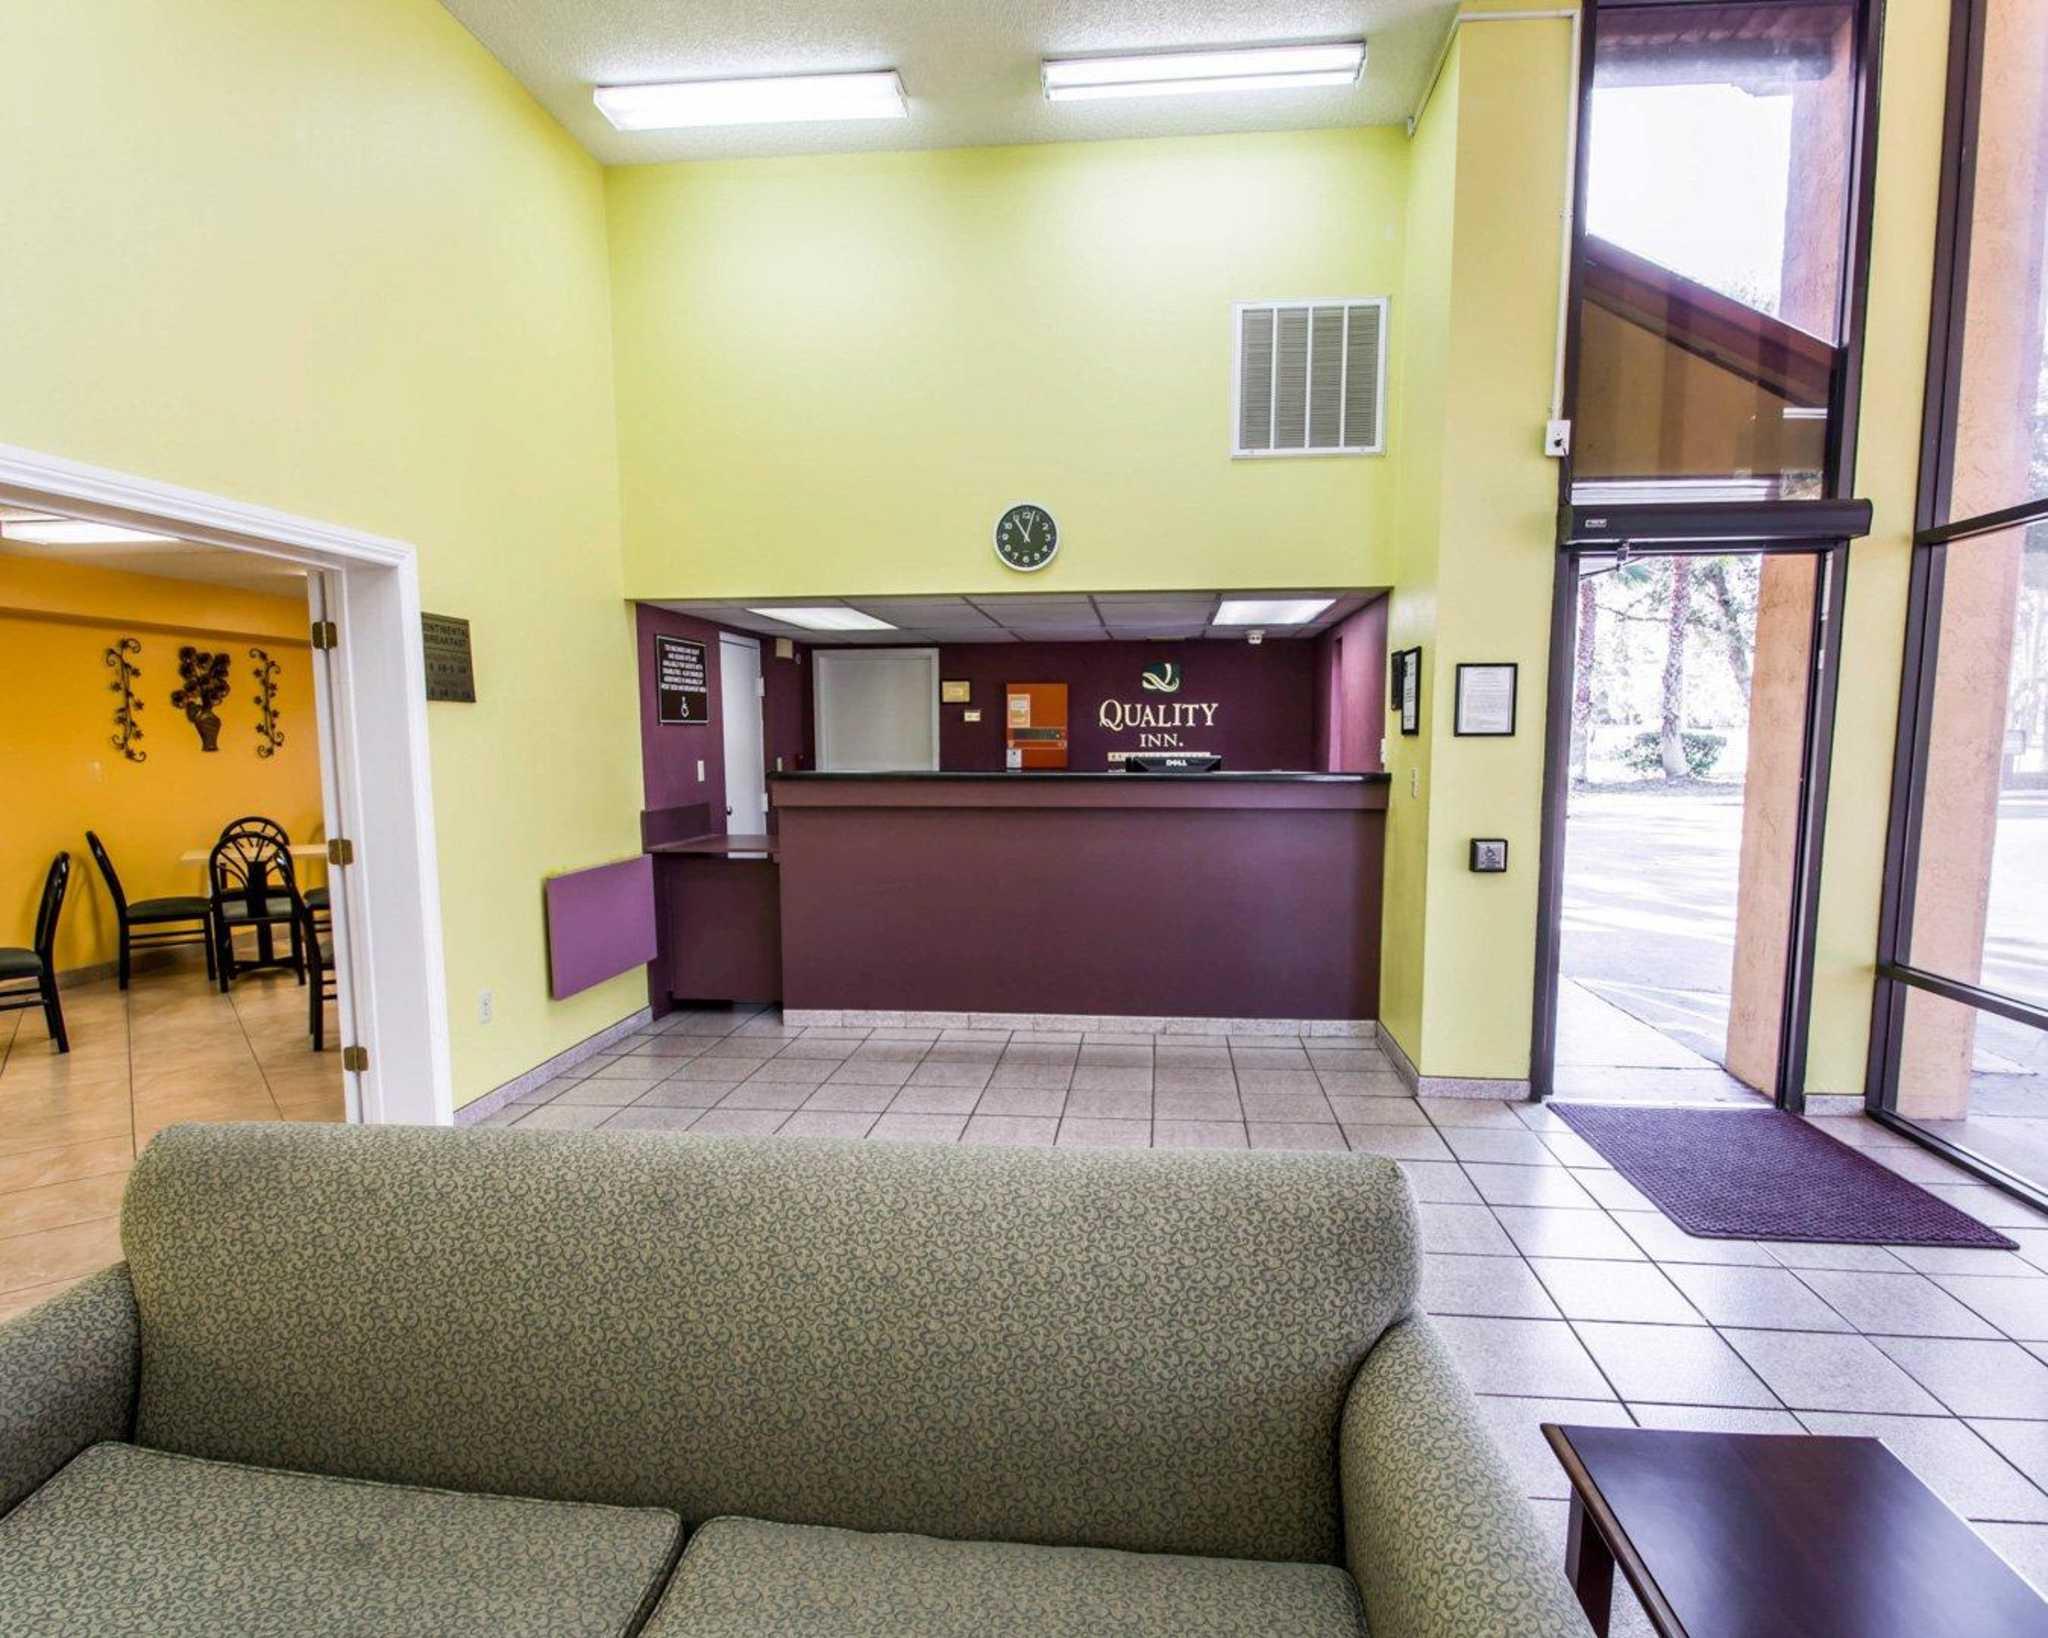 Quality Inn University image 24